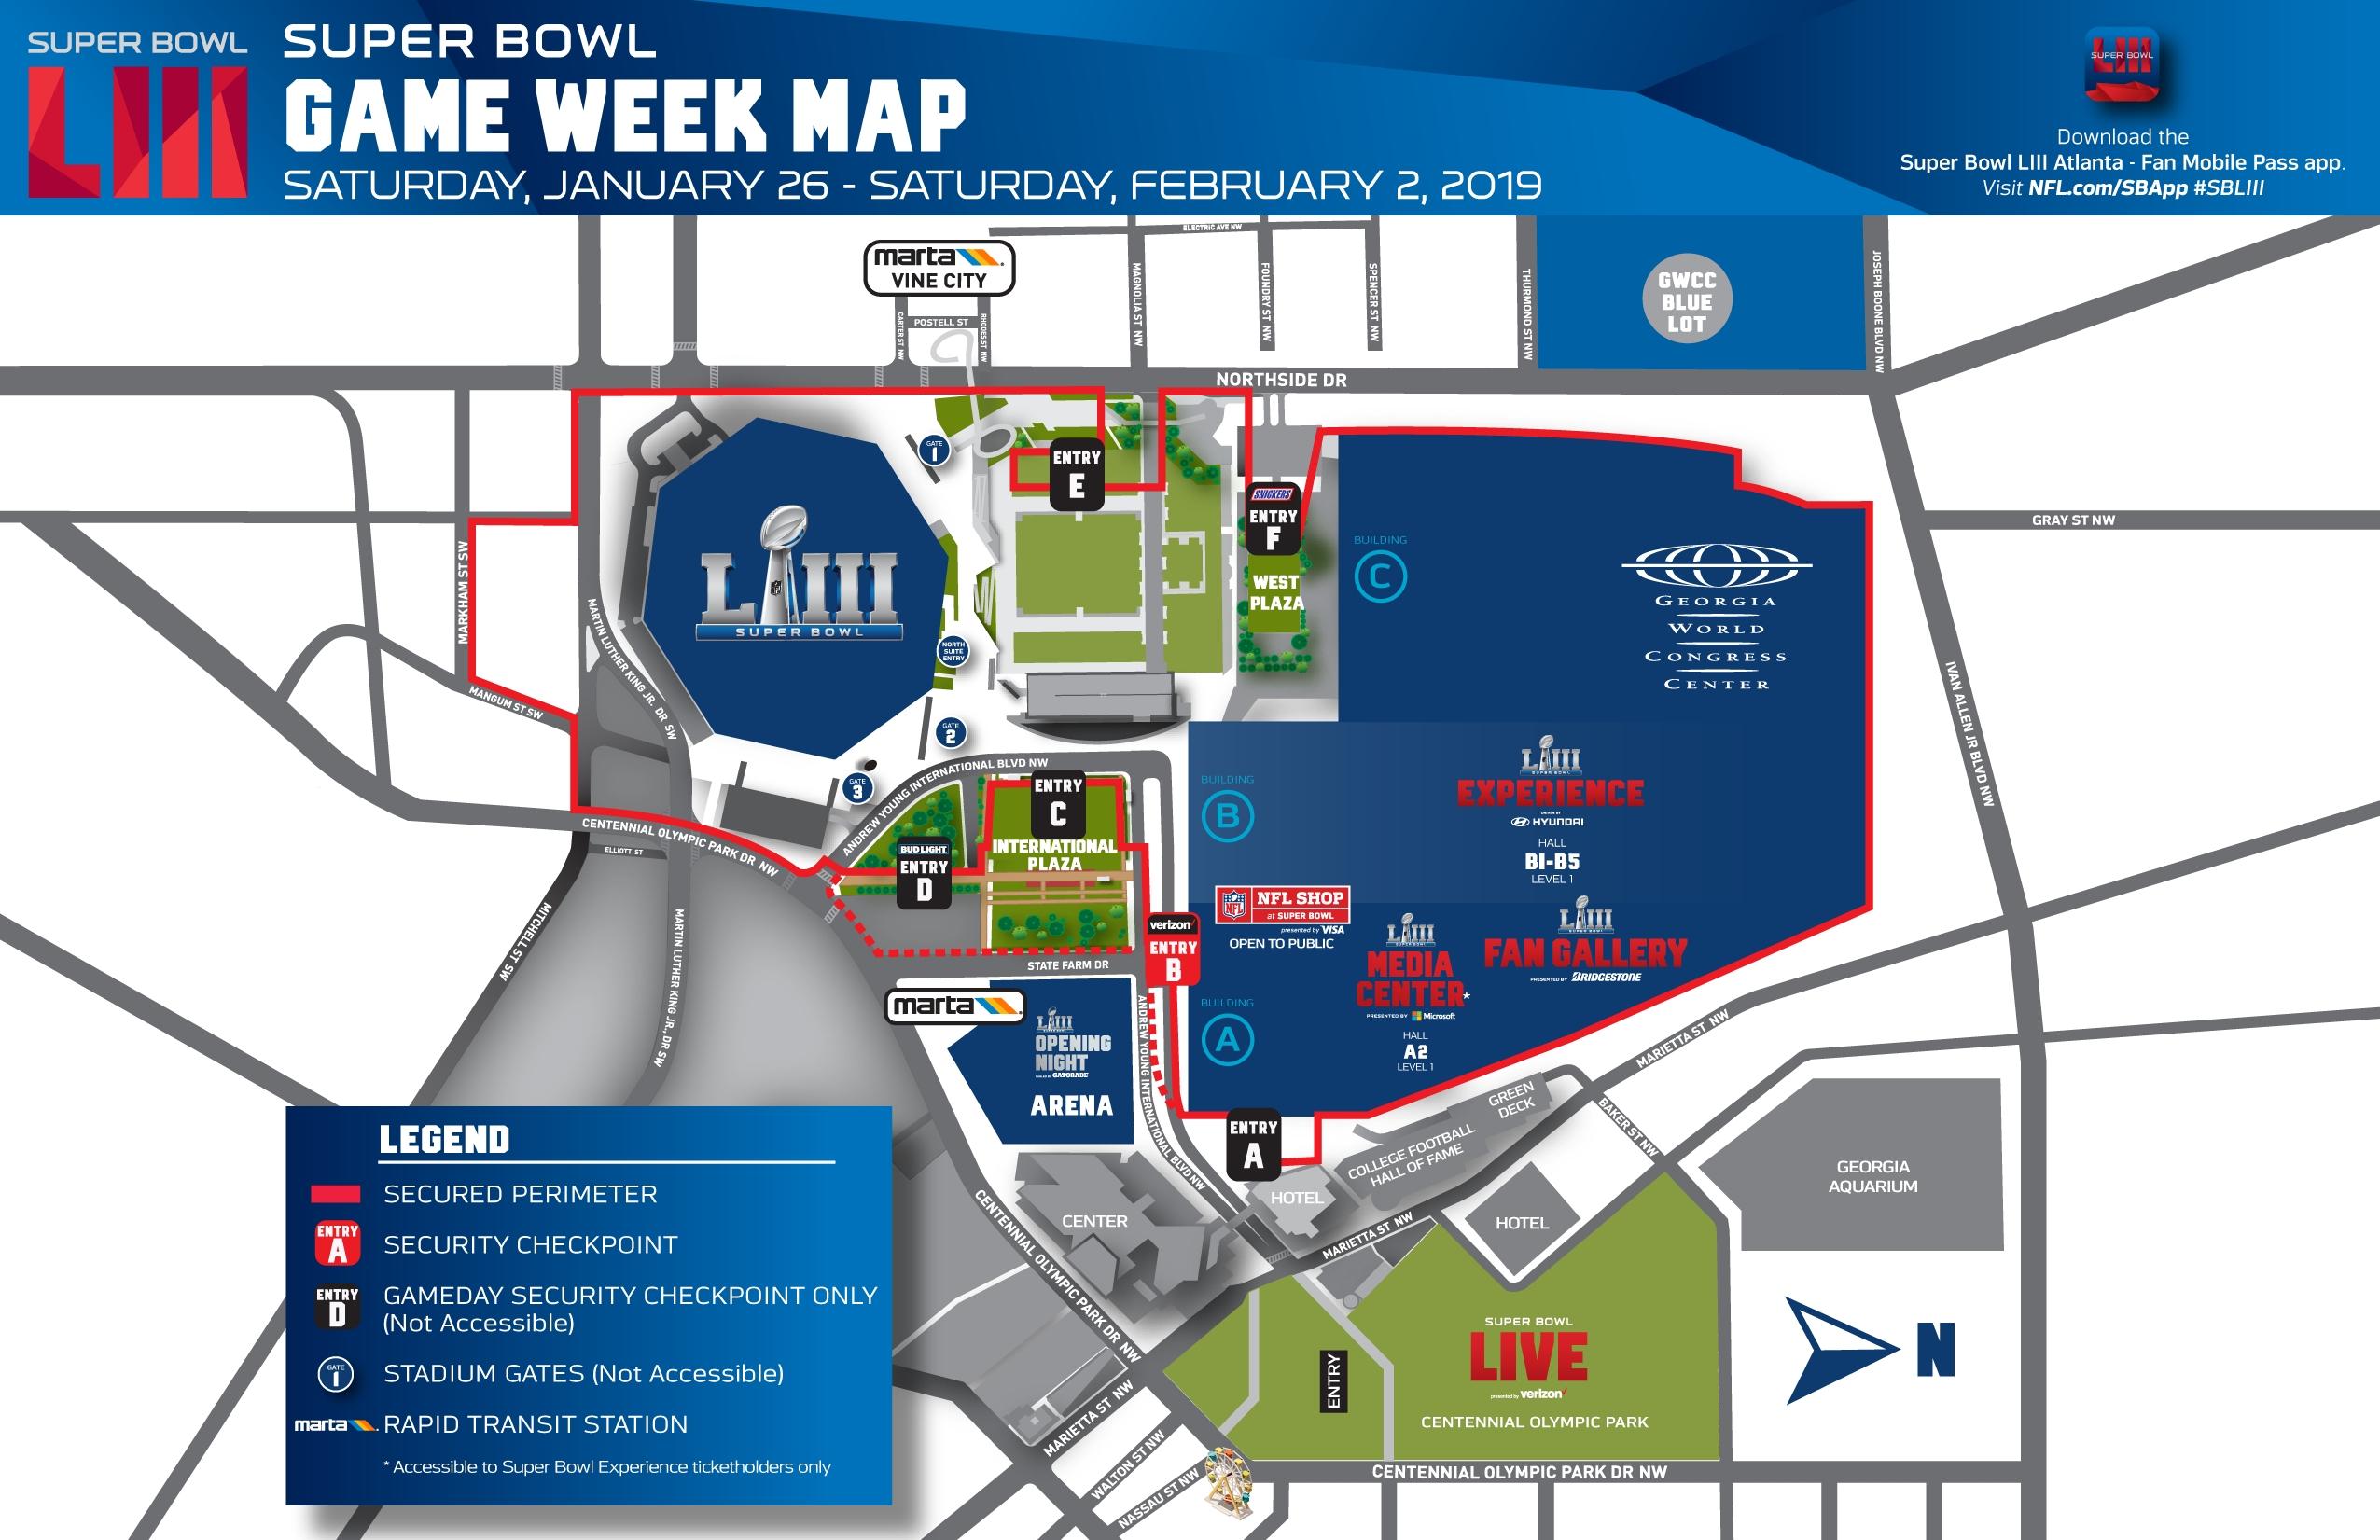 Super Bowl Experience | Nfl | Nfl intended for Map Of Superbowl